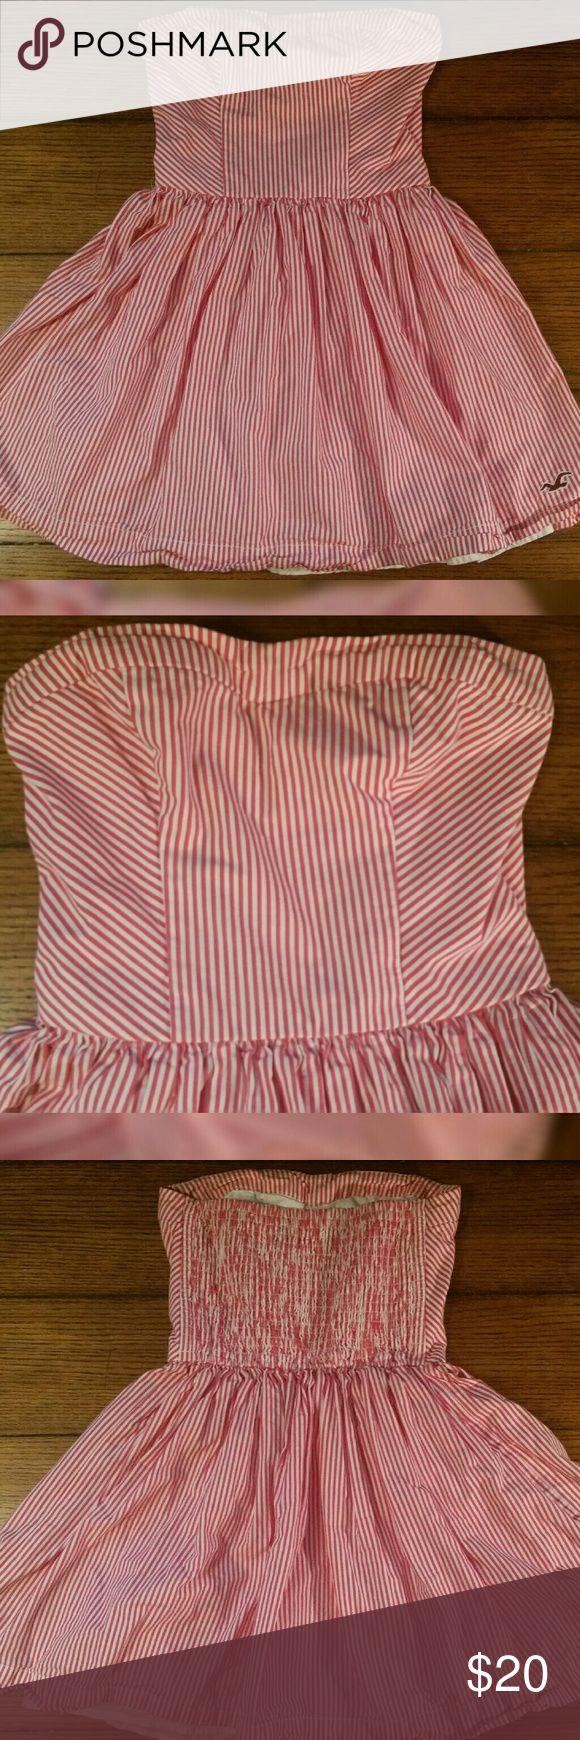 XS Cotton Pink Stripe Strapless Hollister Dress XS Pink Candy Cane Stripe Strapless 100% Cotton Hollister Dress Hollister Dresses Strapless